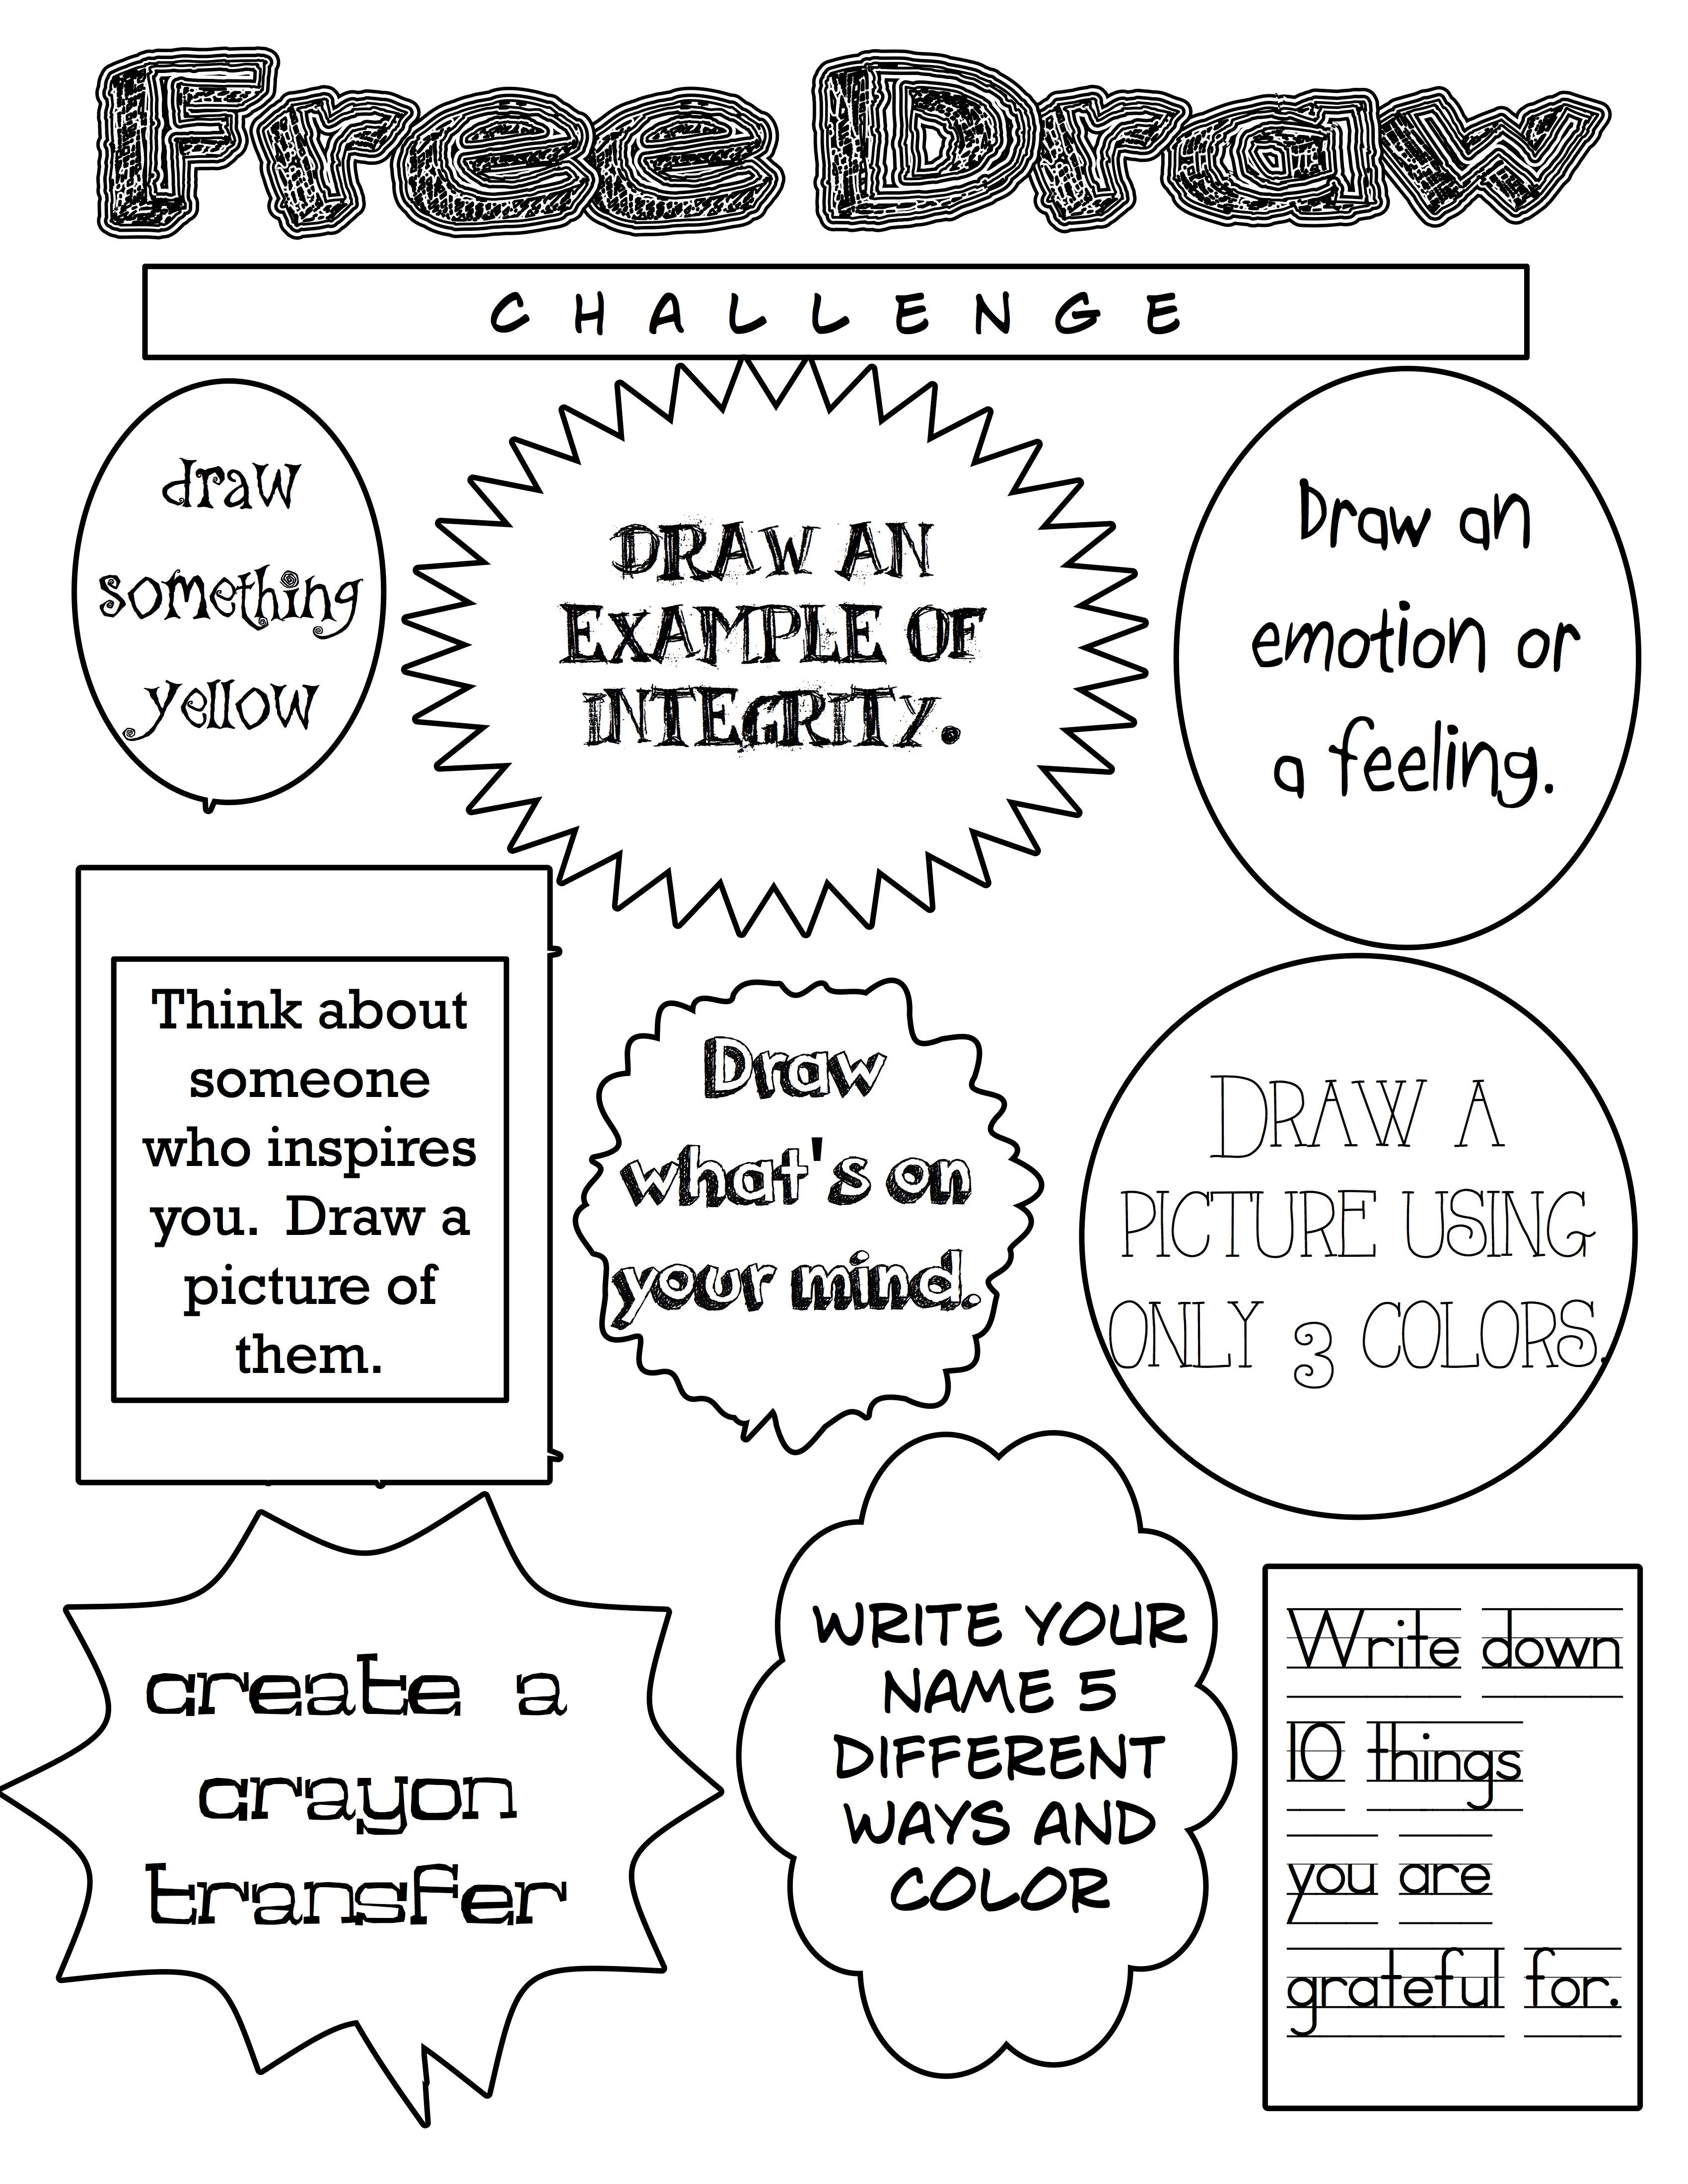 April Free Draw Challenge